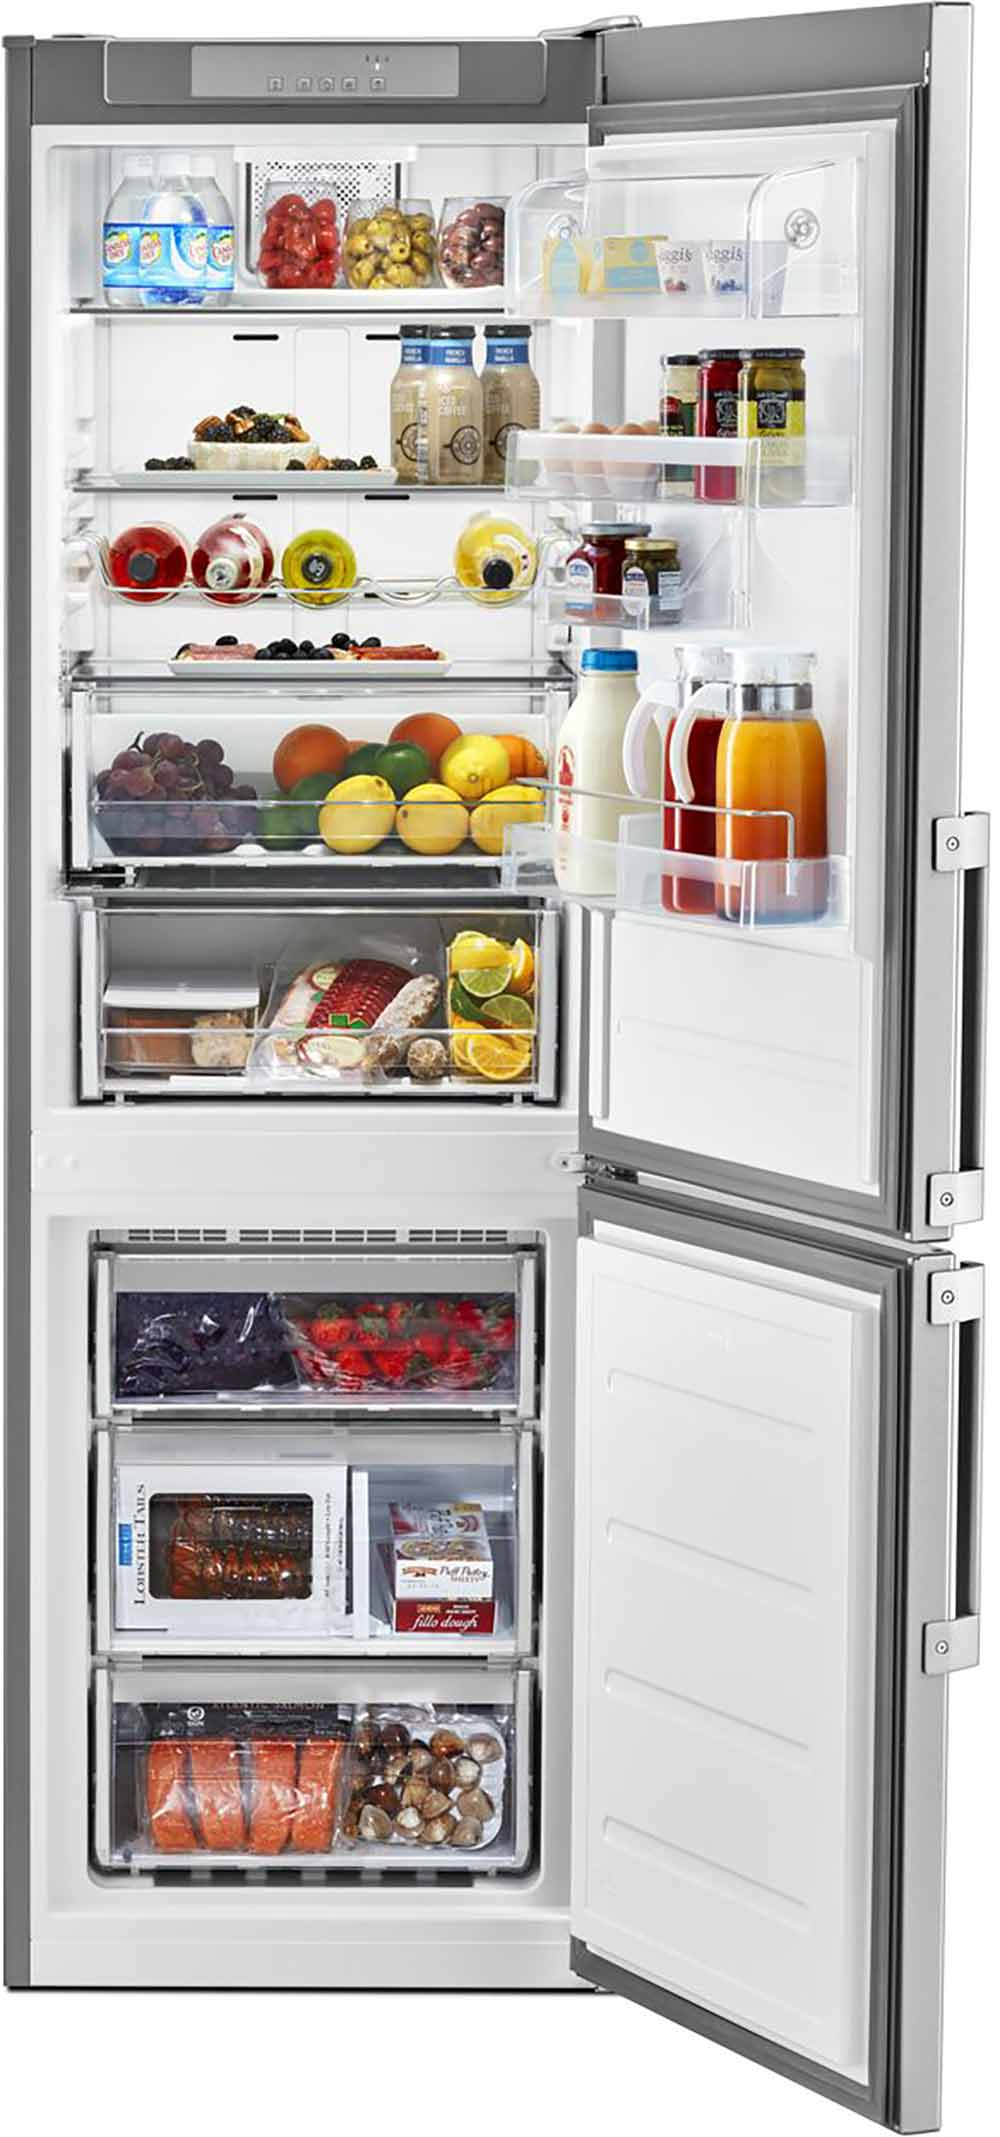 KitchenAid URB551WNGZ Bottom-Mount Refrigerator 24-inches wide -